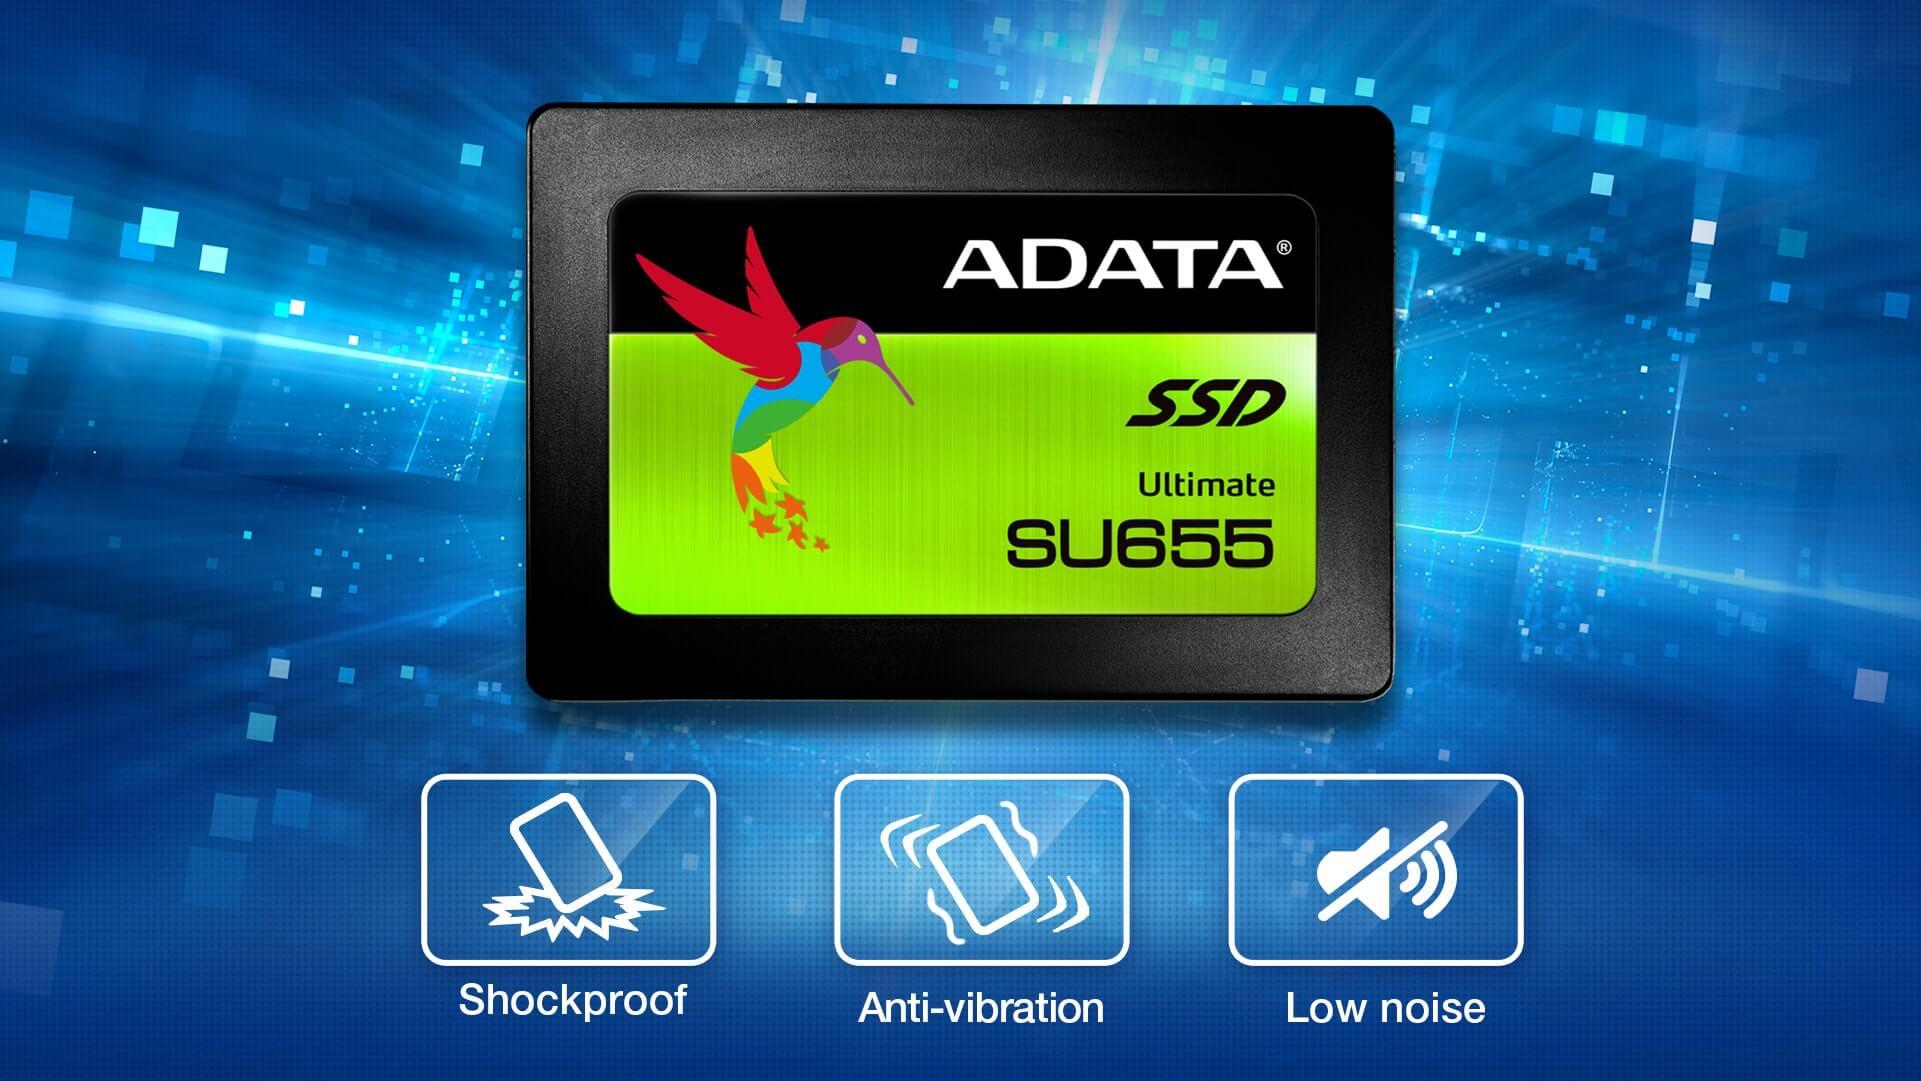 اس اس دی ای دیتا Adata SSD Ultimate SU655 240GB